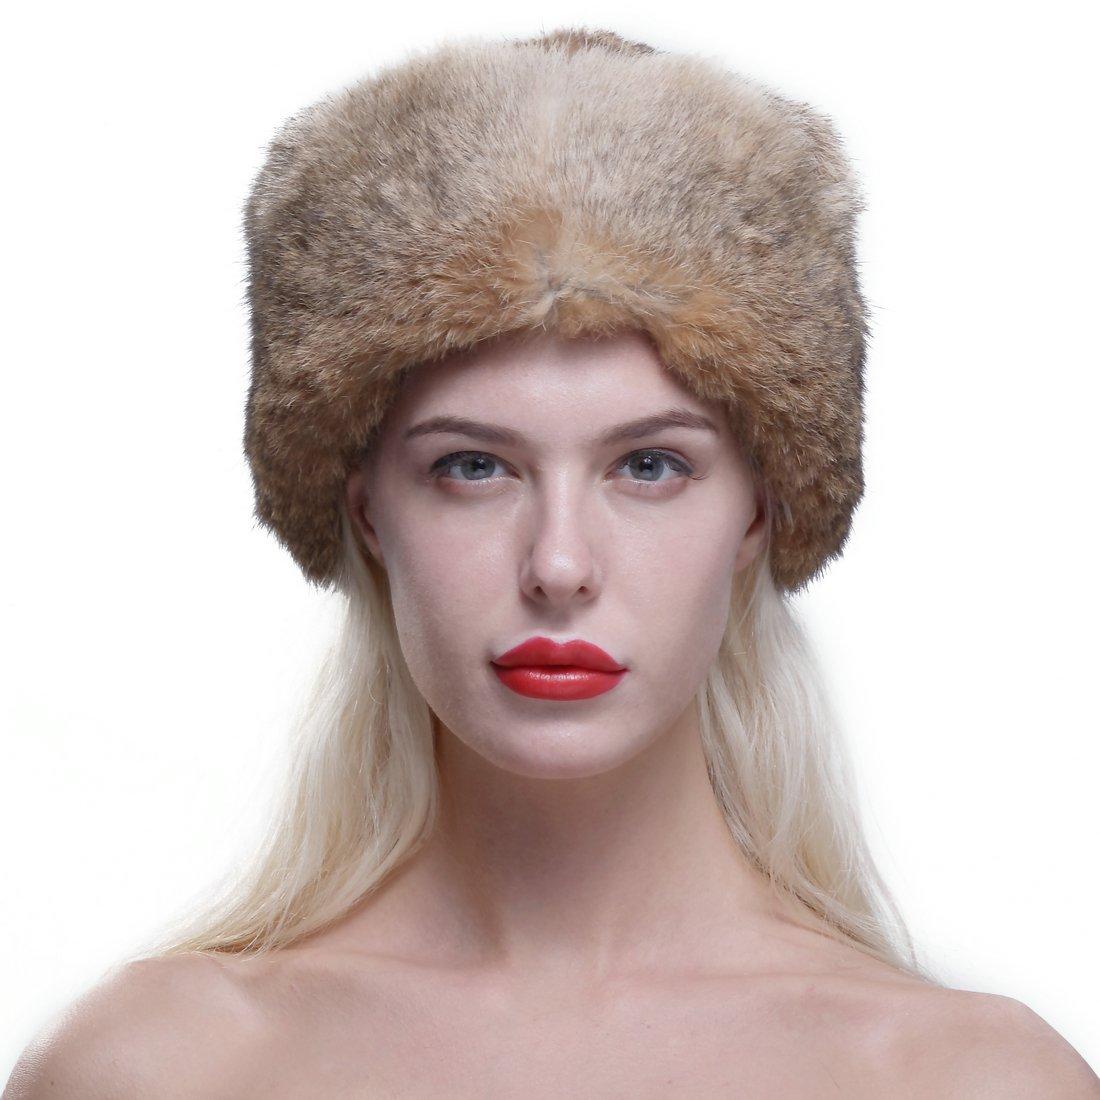 URSFUR Genuine Rabbit Fur Davy Crockett帽子Coonskin Cap with Raccoon Tail One Size ブラウン B01MEHOZXL